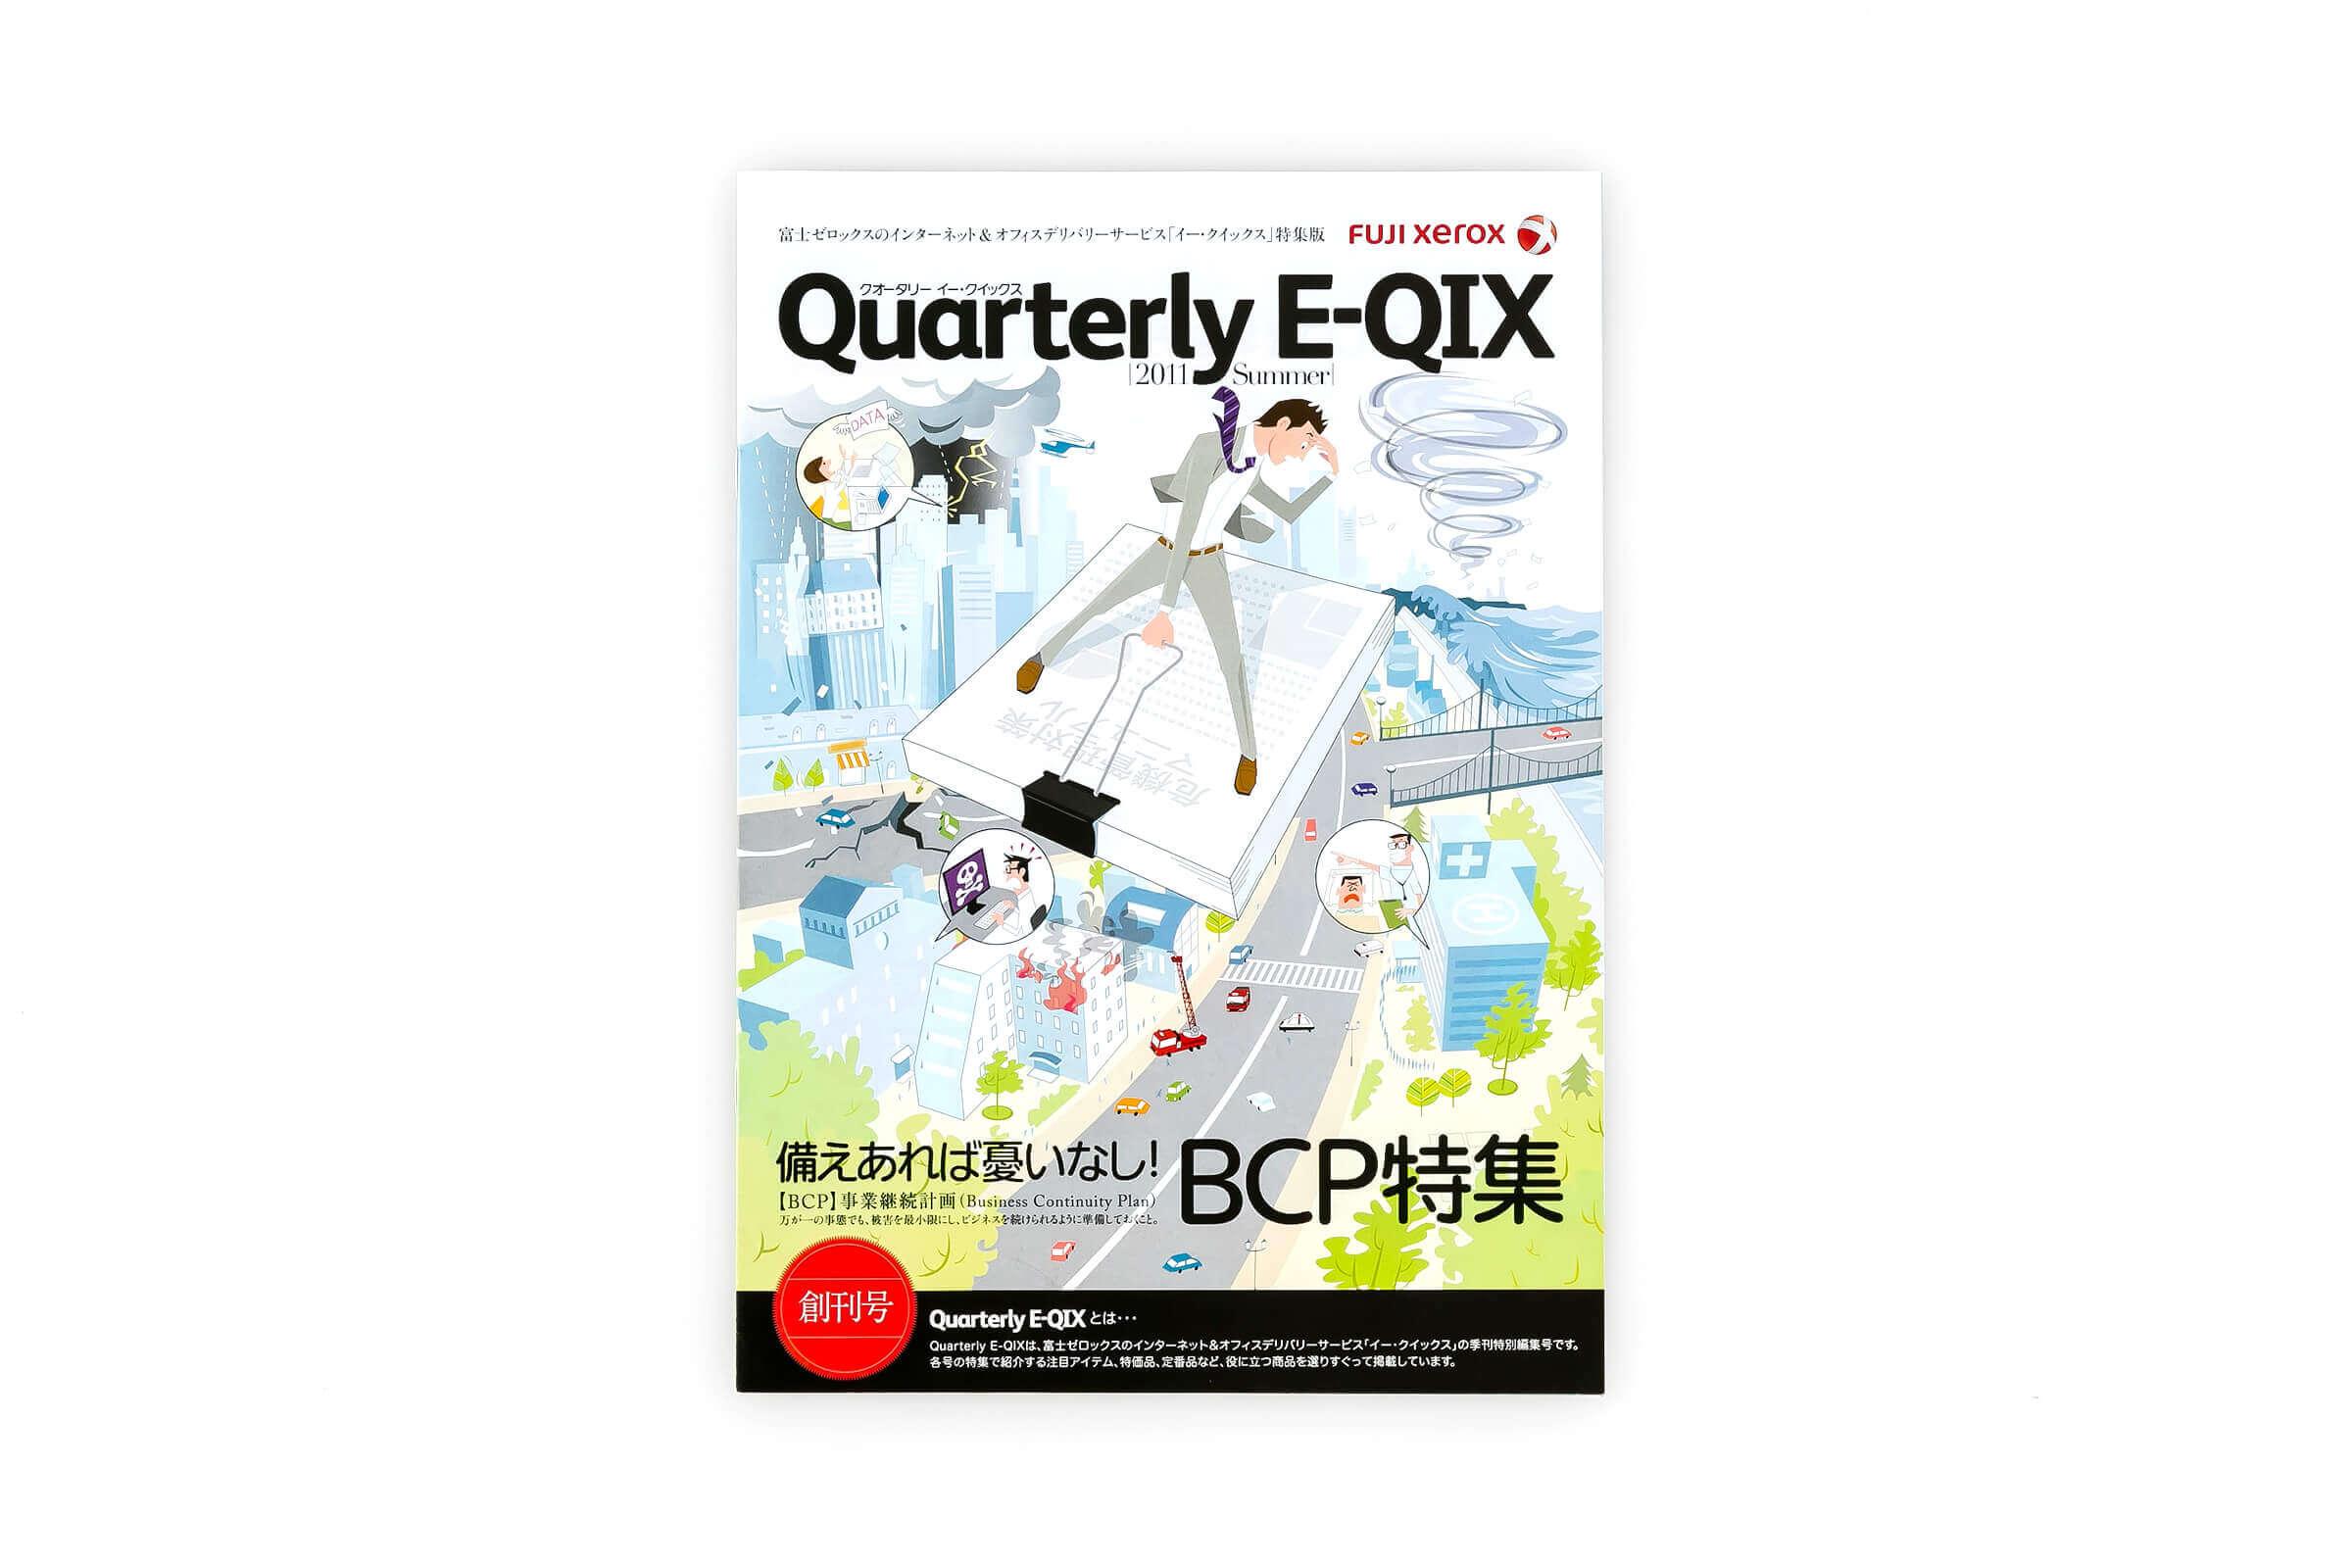 Quarterly E-QIX 創刊号 表紙